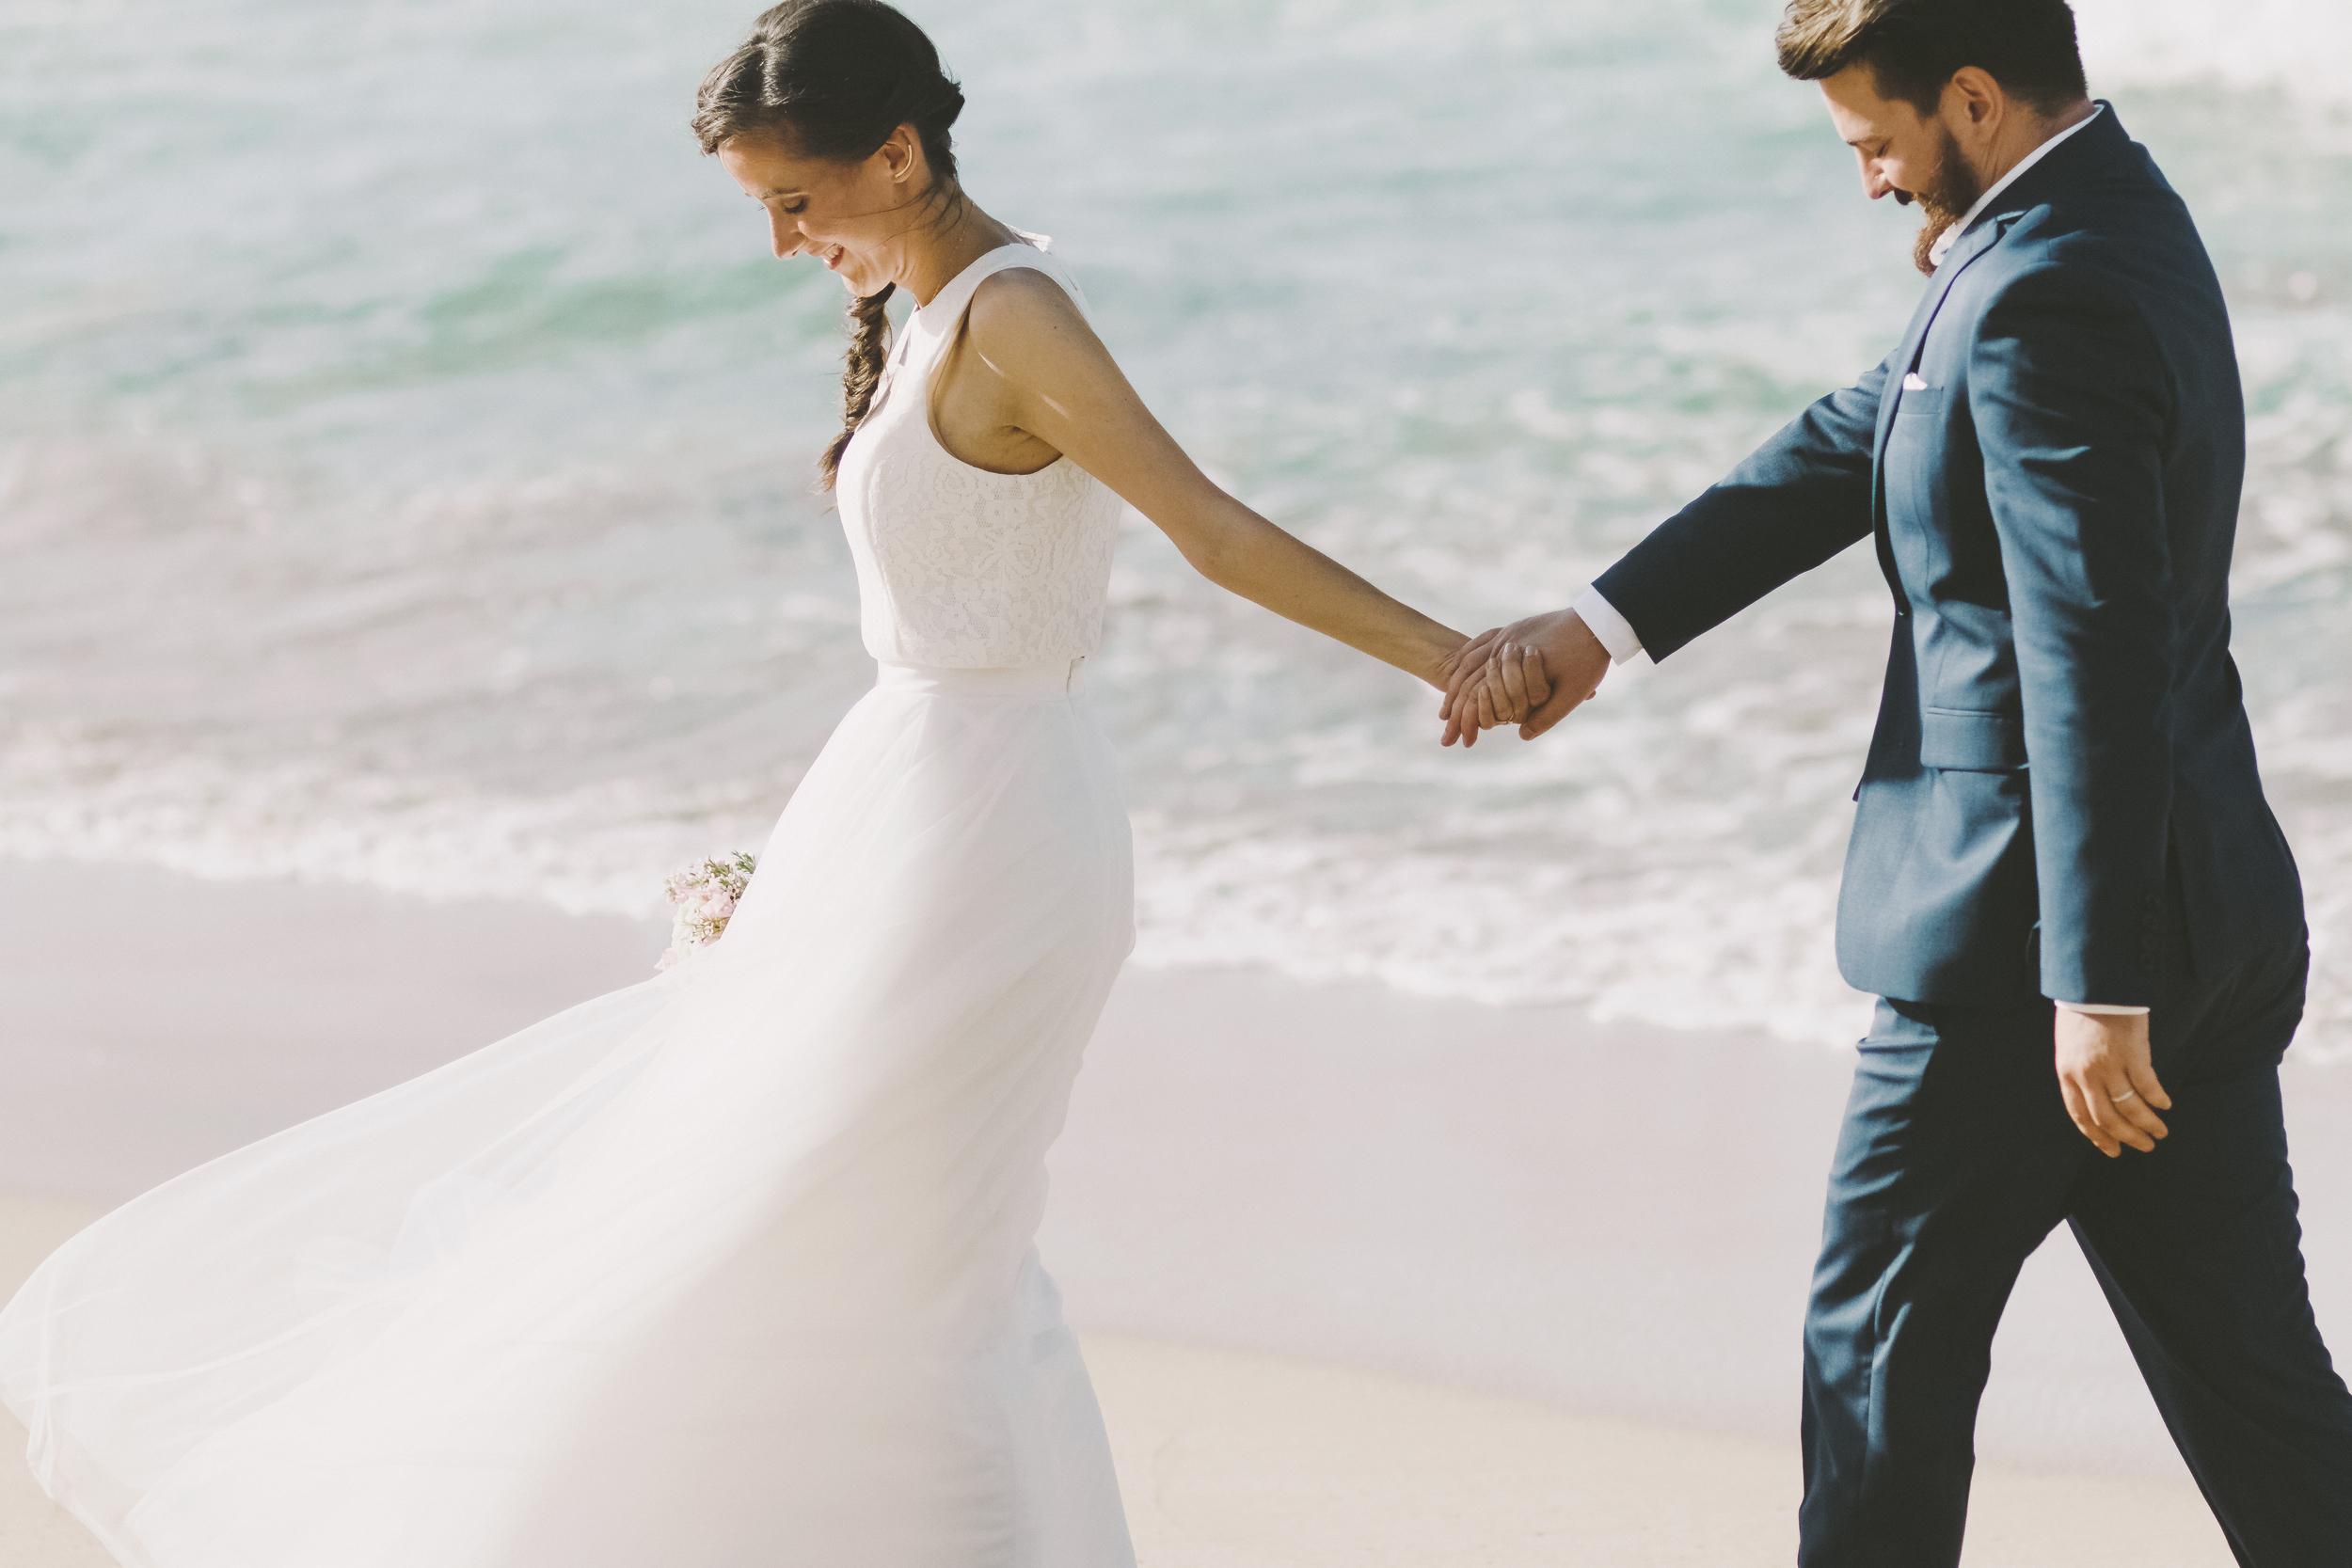 angie-diaz-photography-maui-wedding-ironwoods-beach-28.jpg